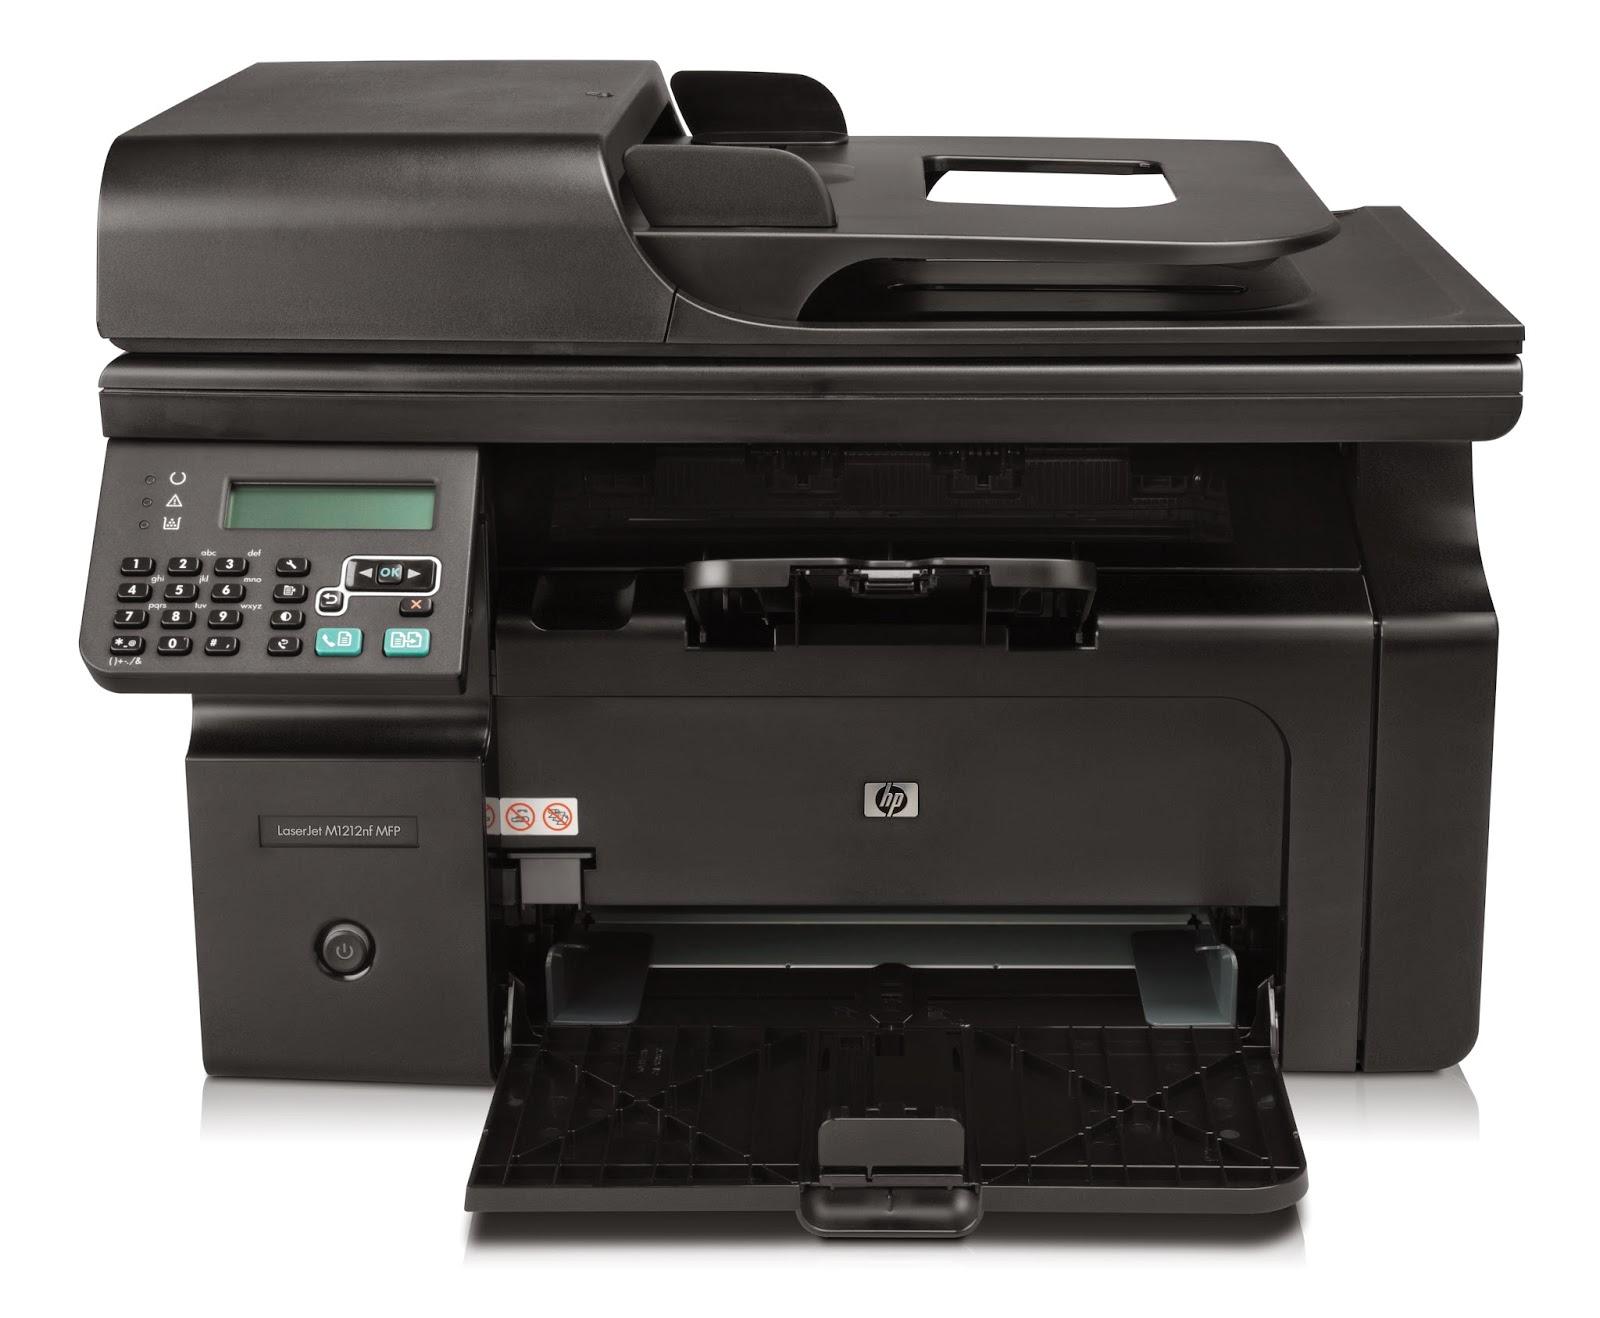 Драйвер Для Сканера Laserjet M1214nfh Mfp